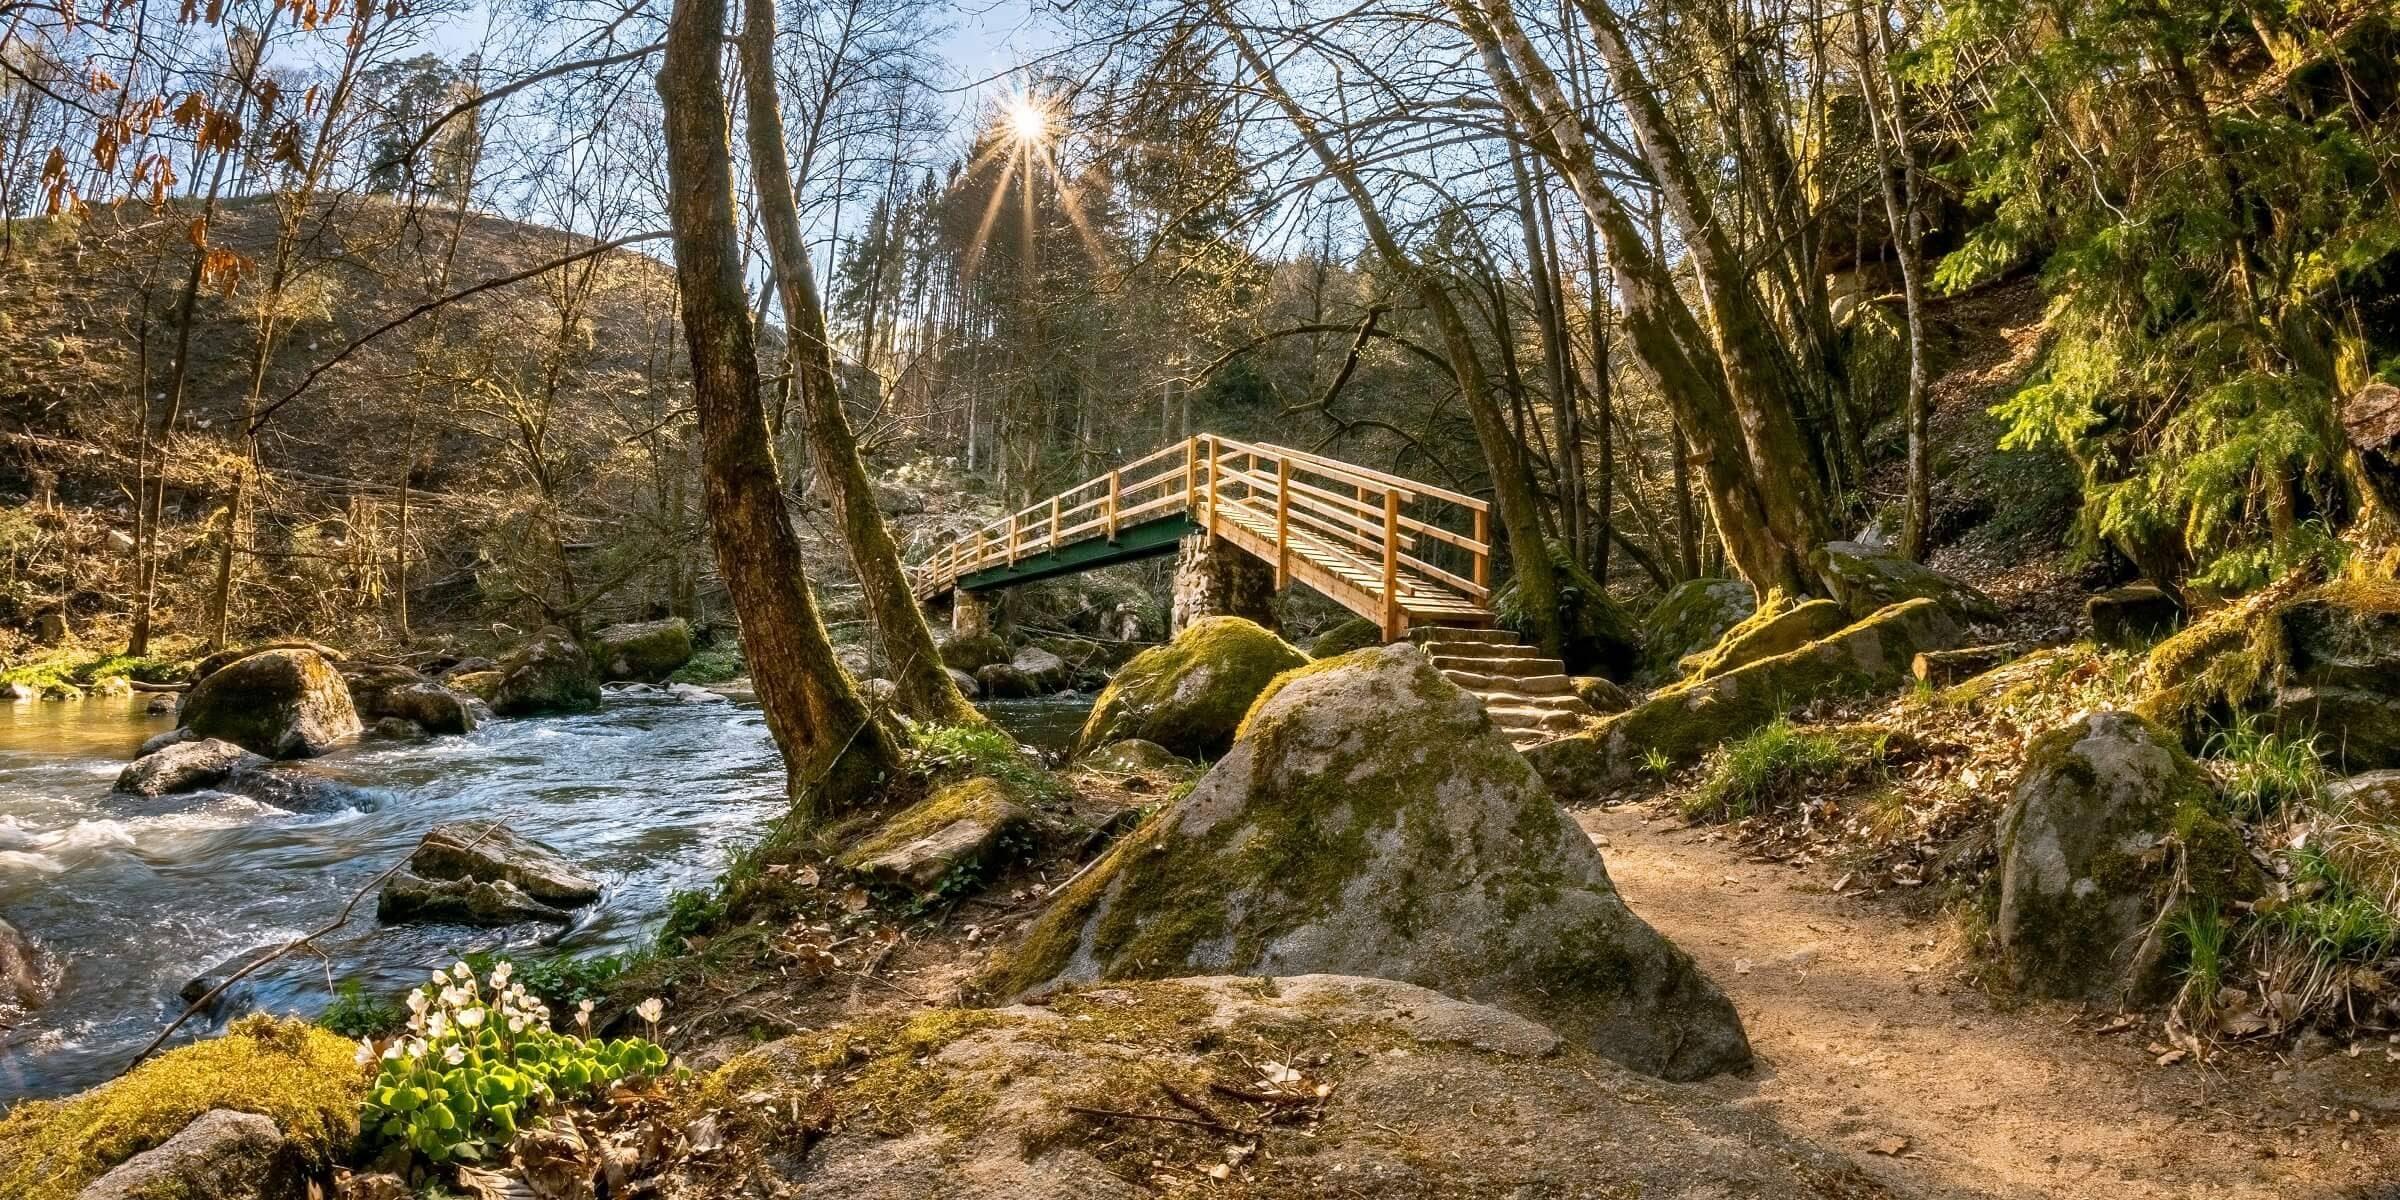 Singlereise nach Bad Leonfelden - Brücke über dem Fluss